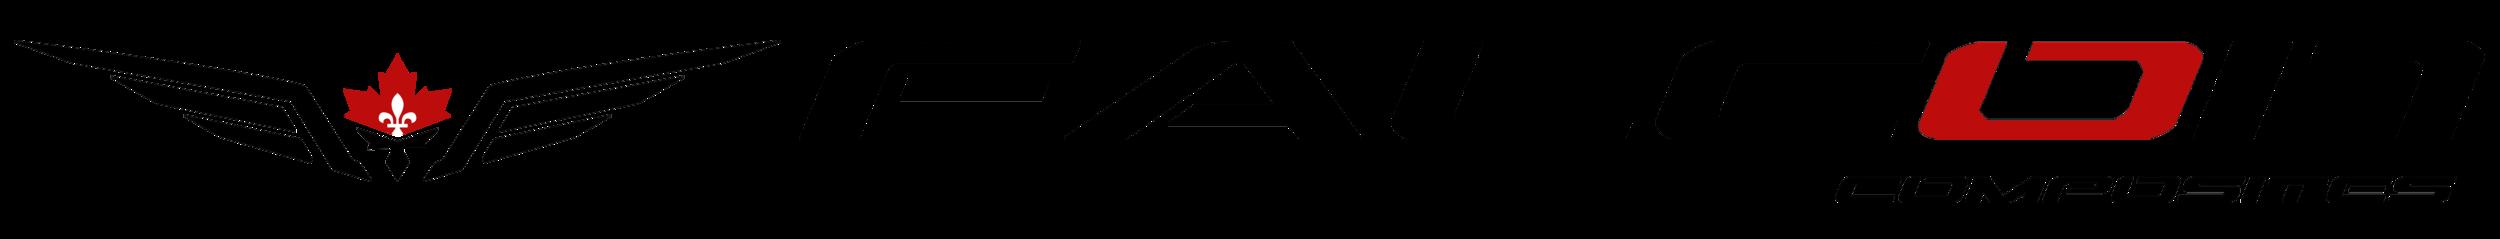 Logo long noir.png